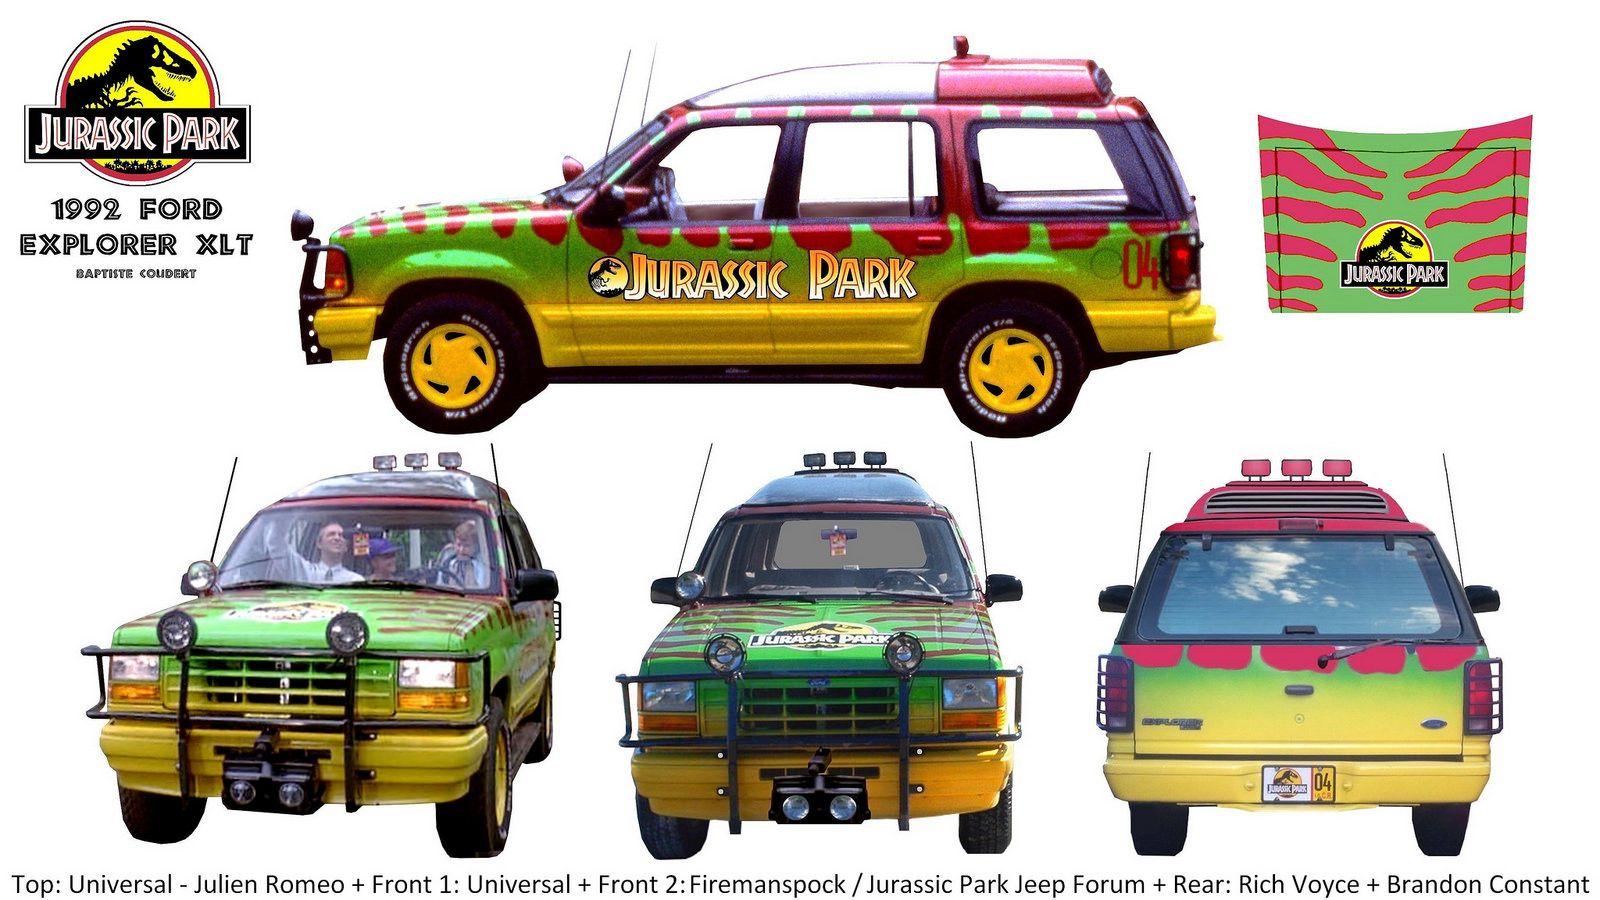 Jurassic Park World Concepts Jurassic Park Jeep Jurassic Park